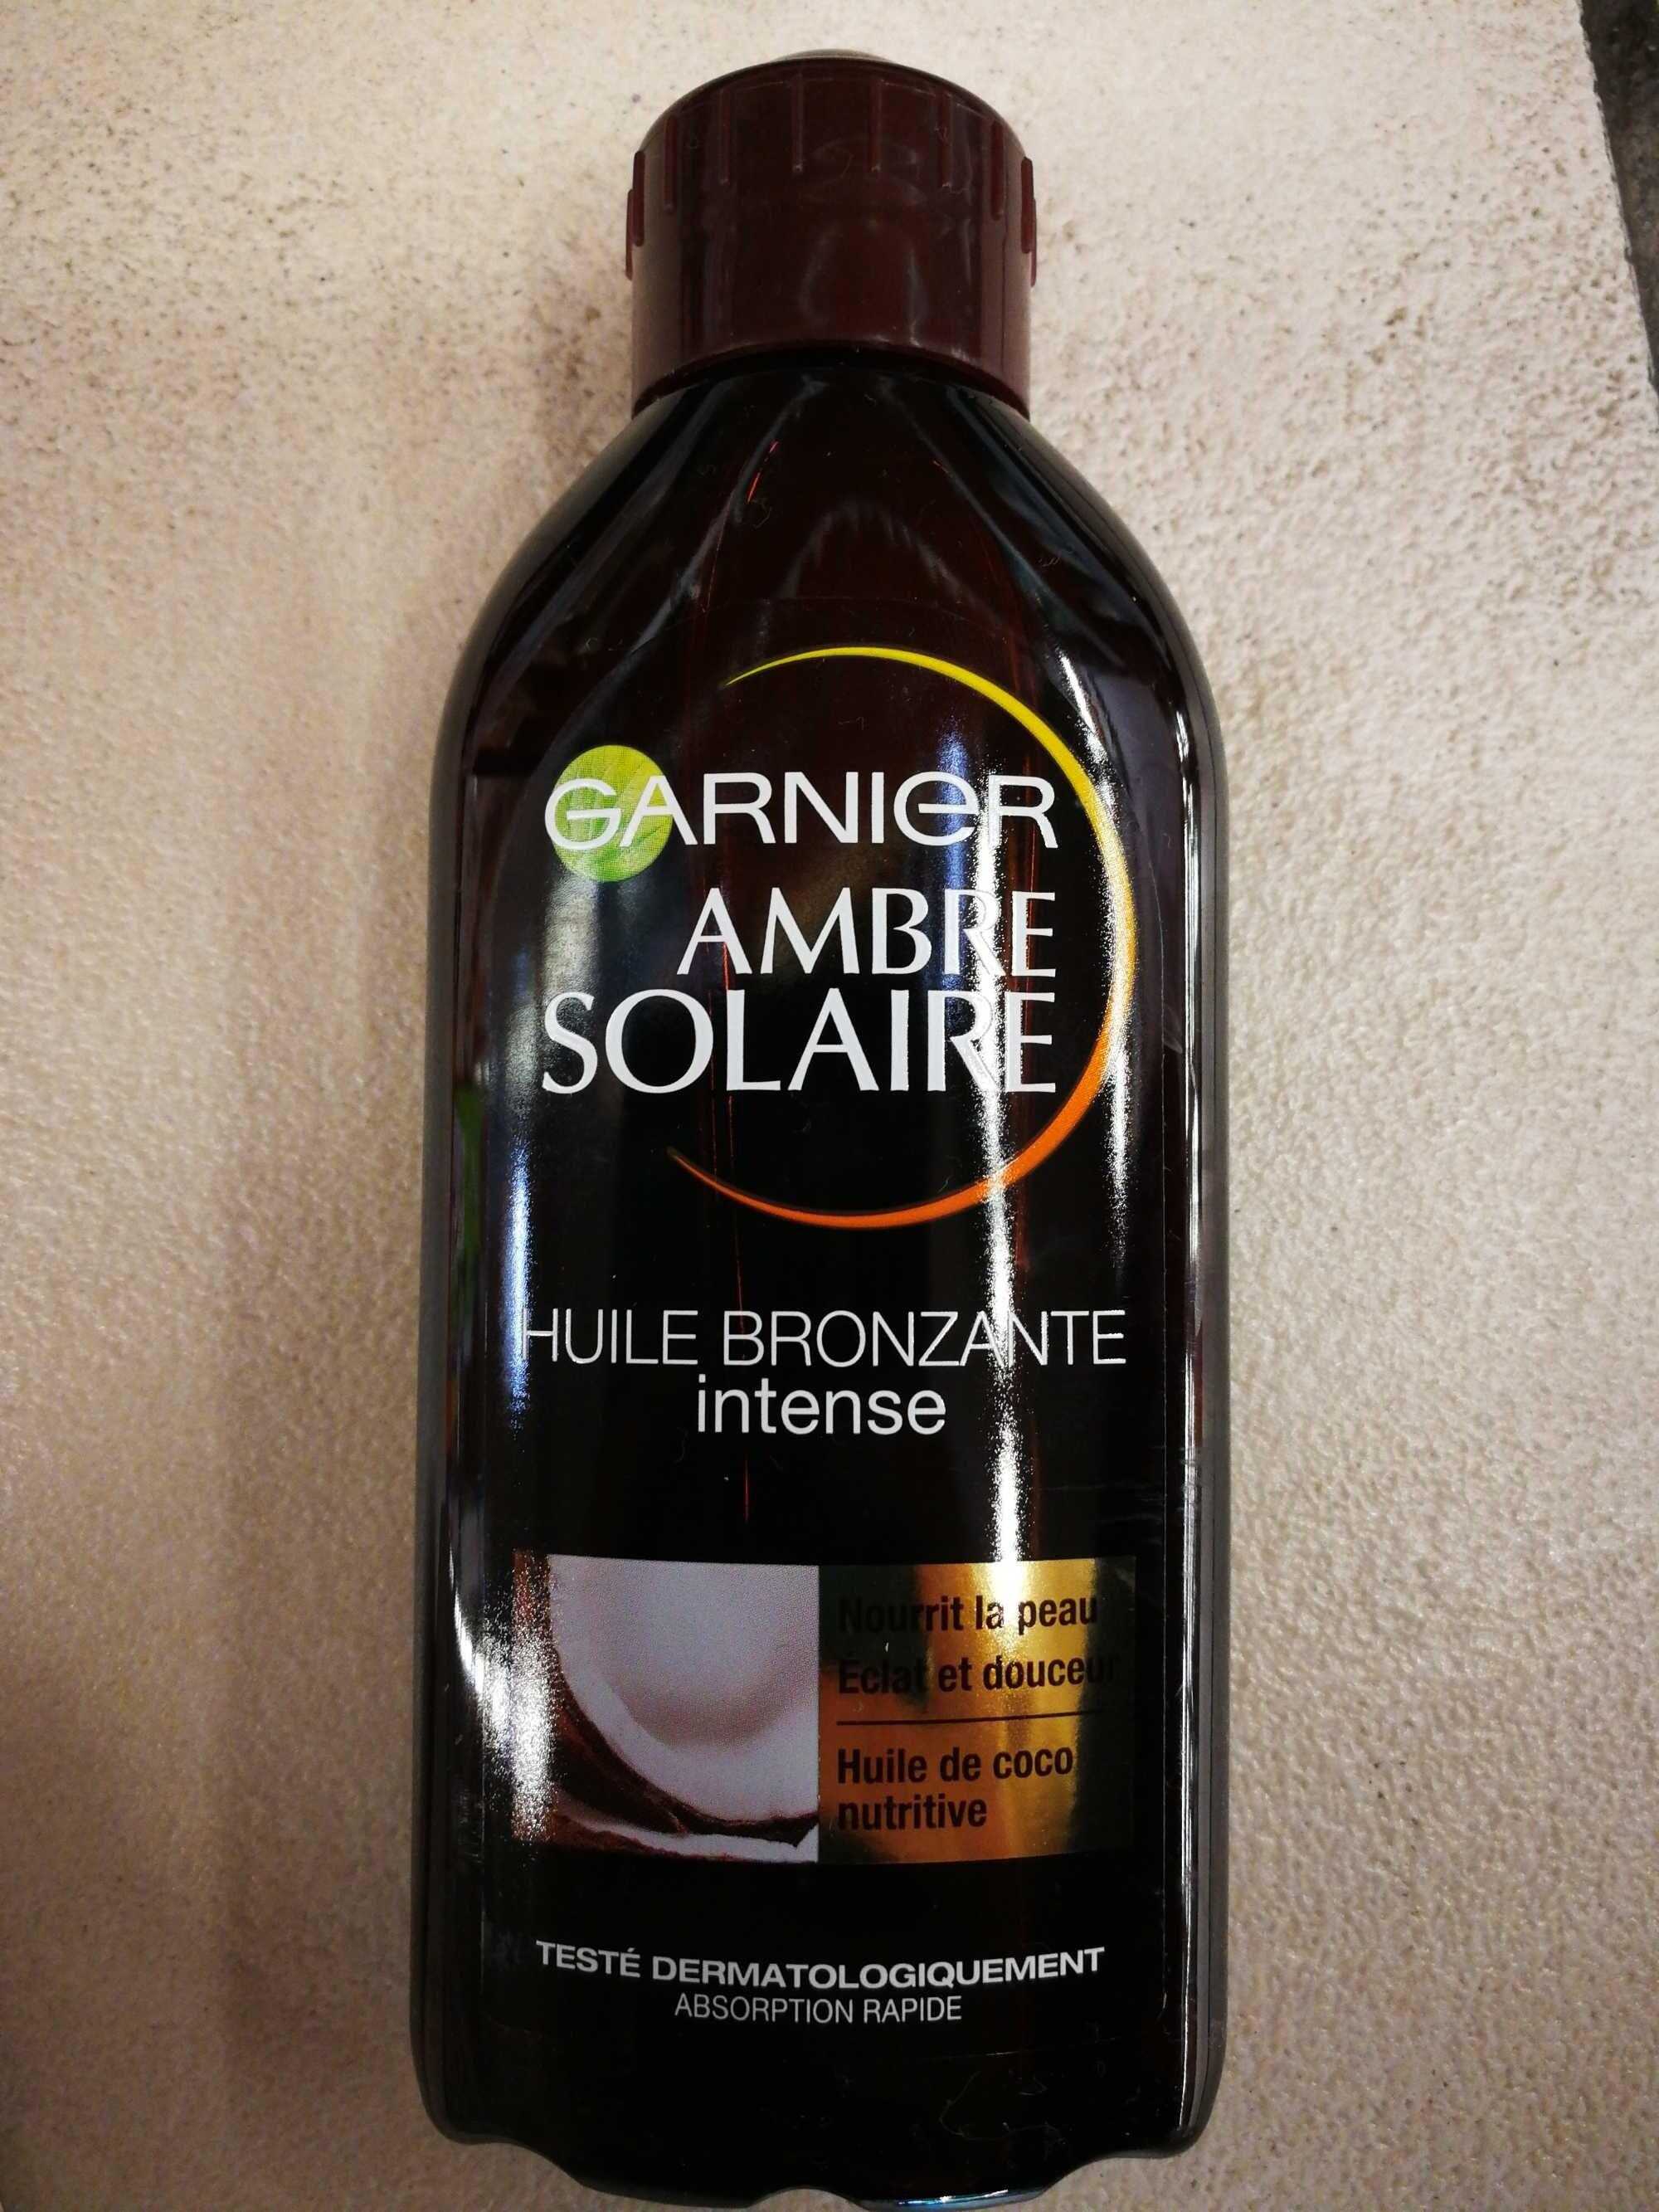 Huile bronzante intense - Product - fr